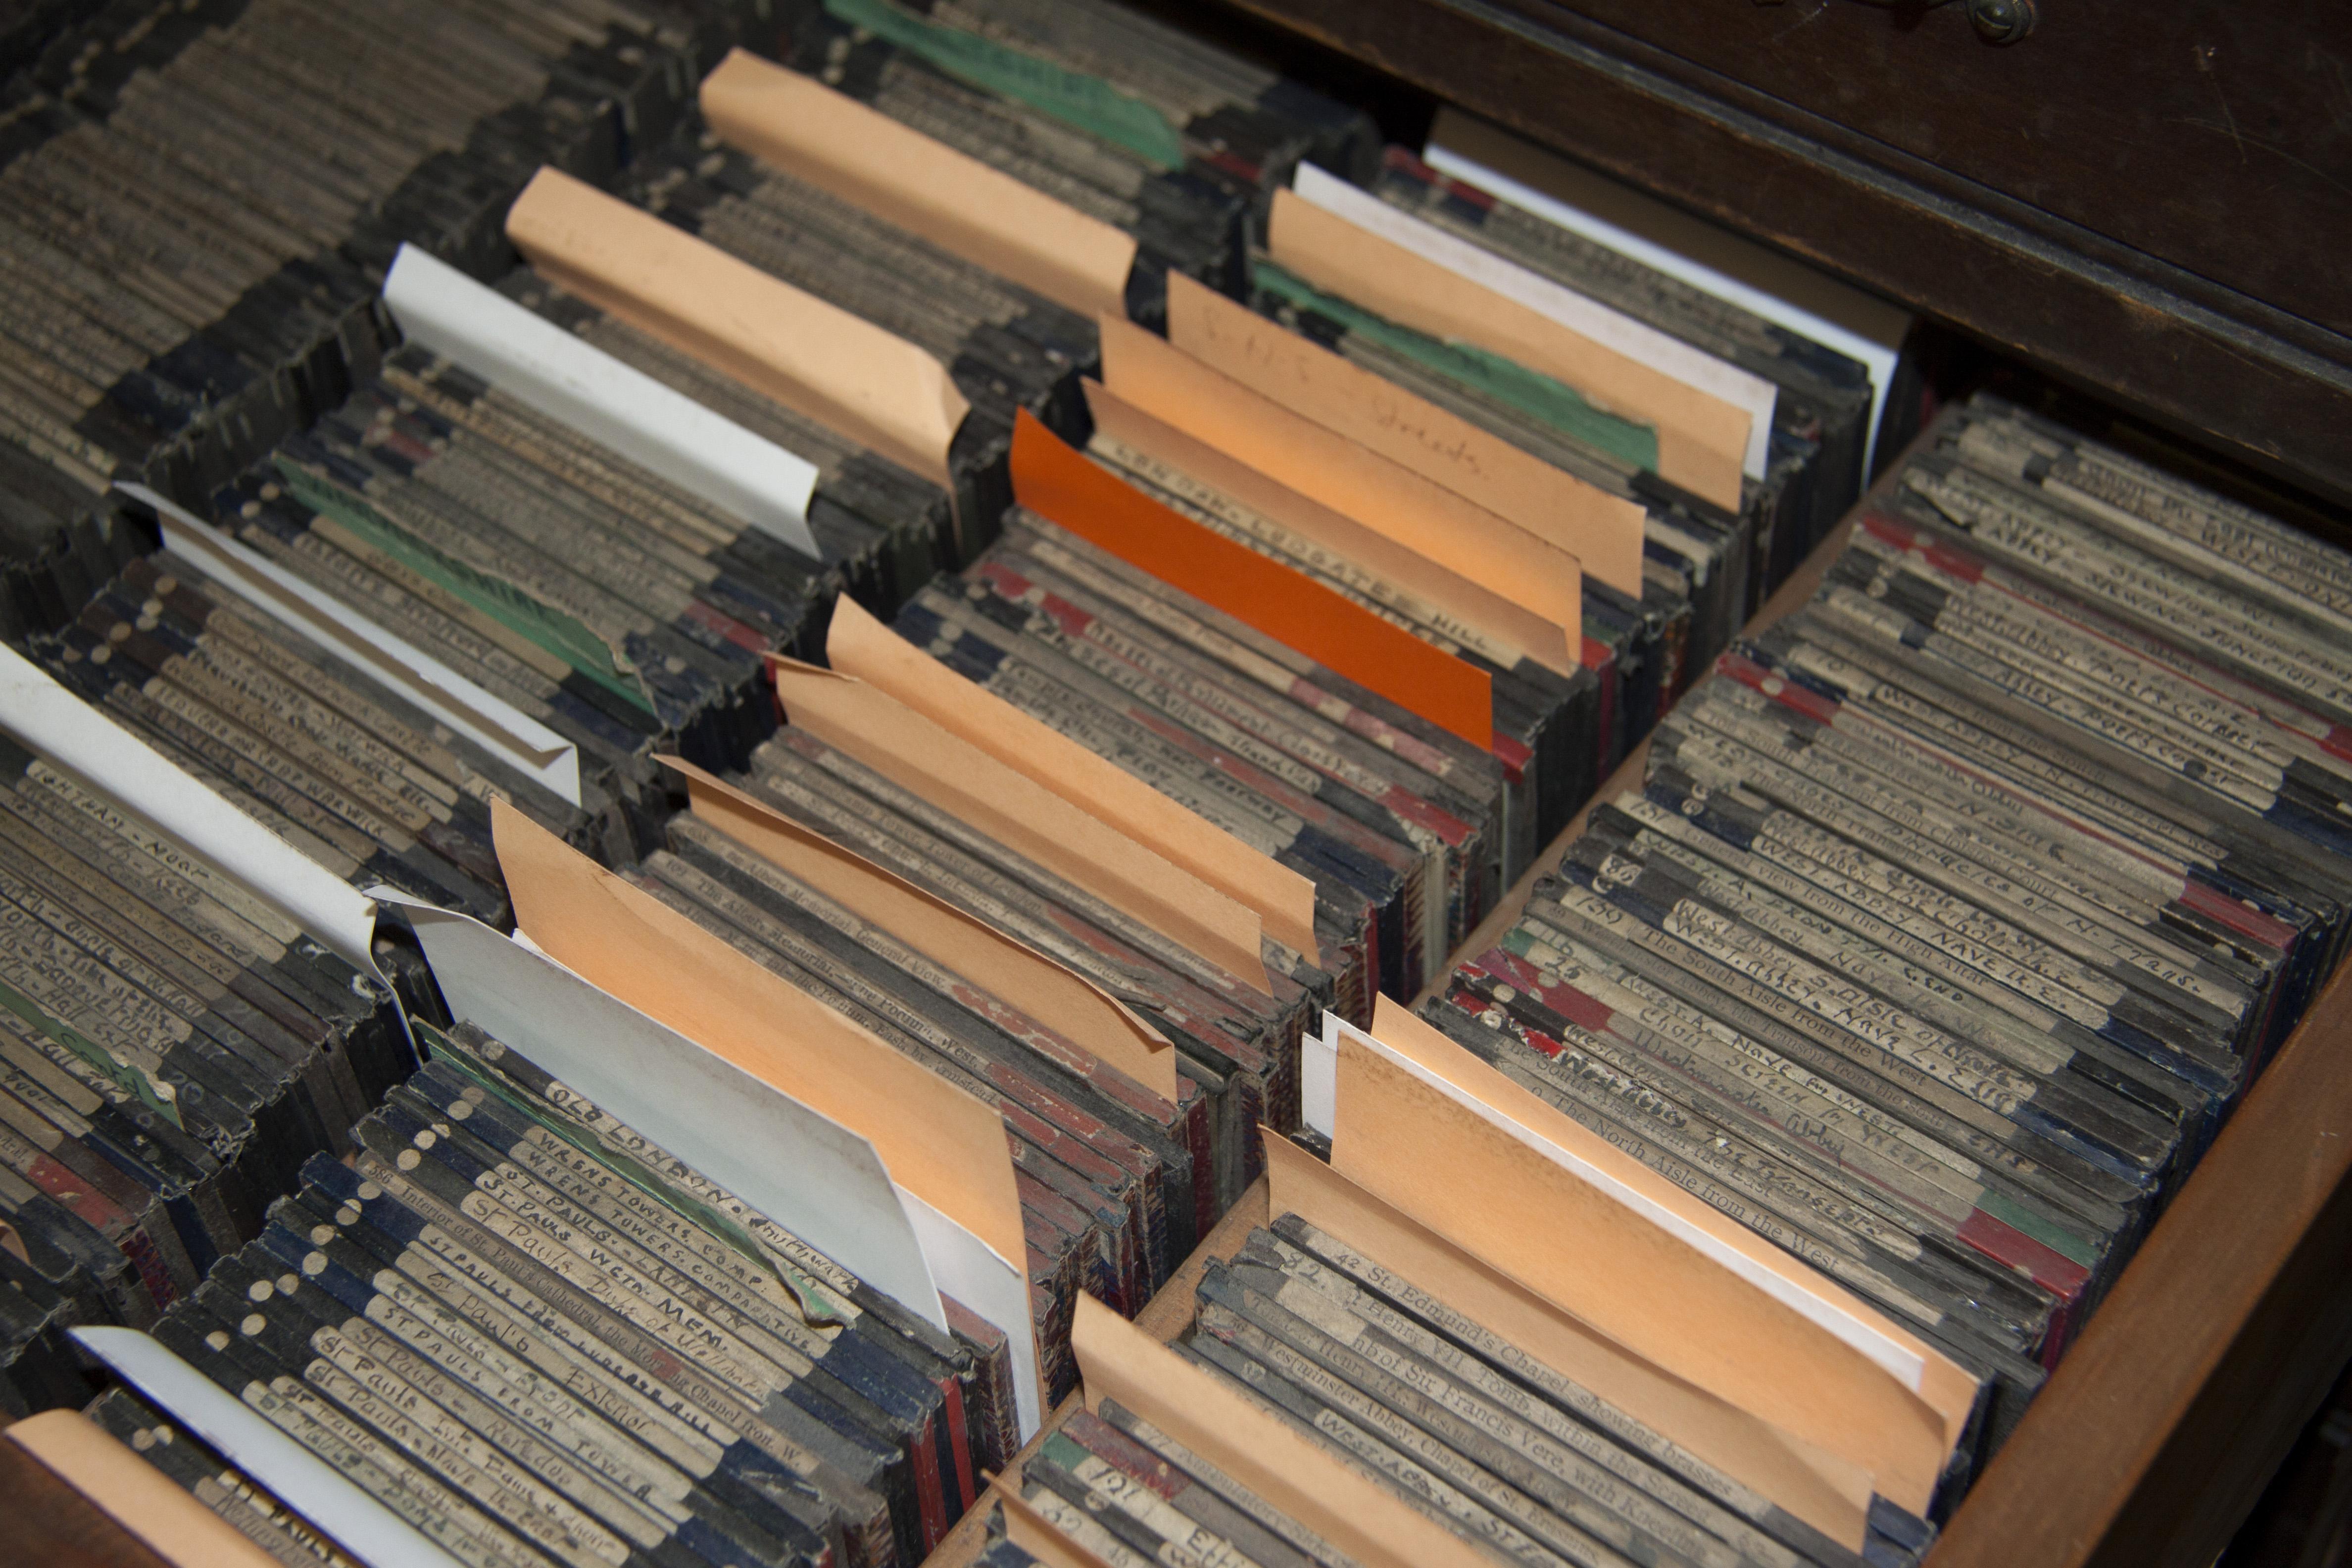 Lantern slide collection